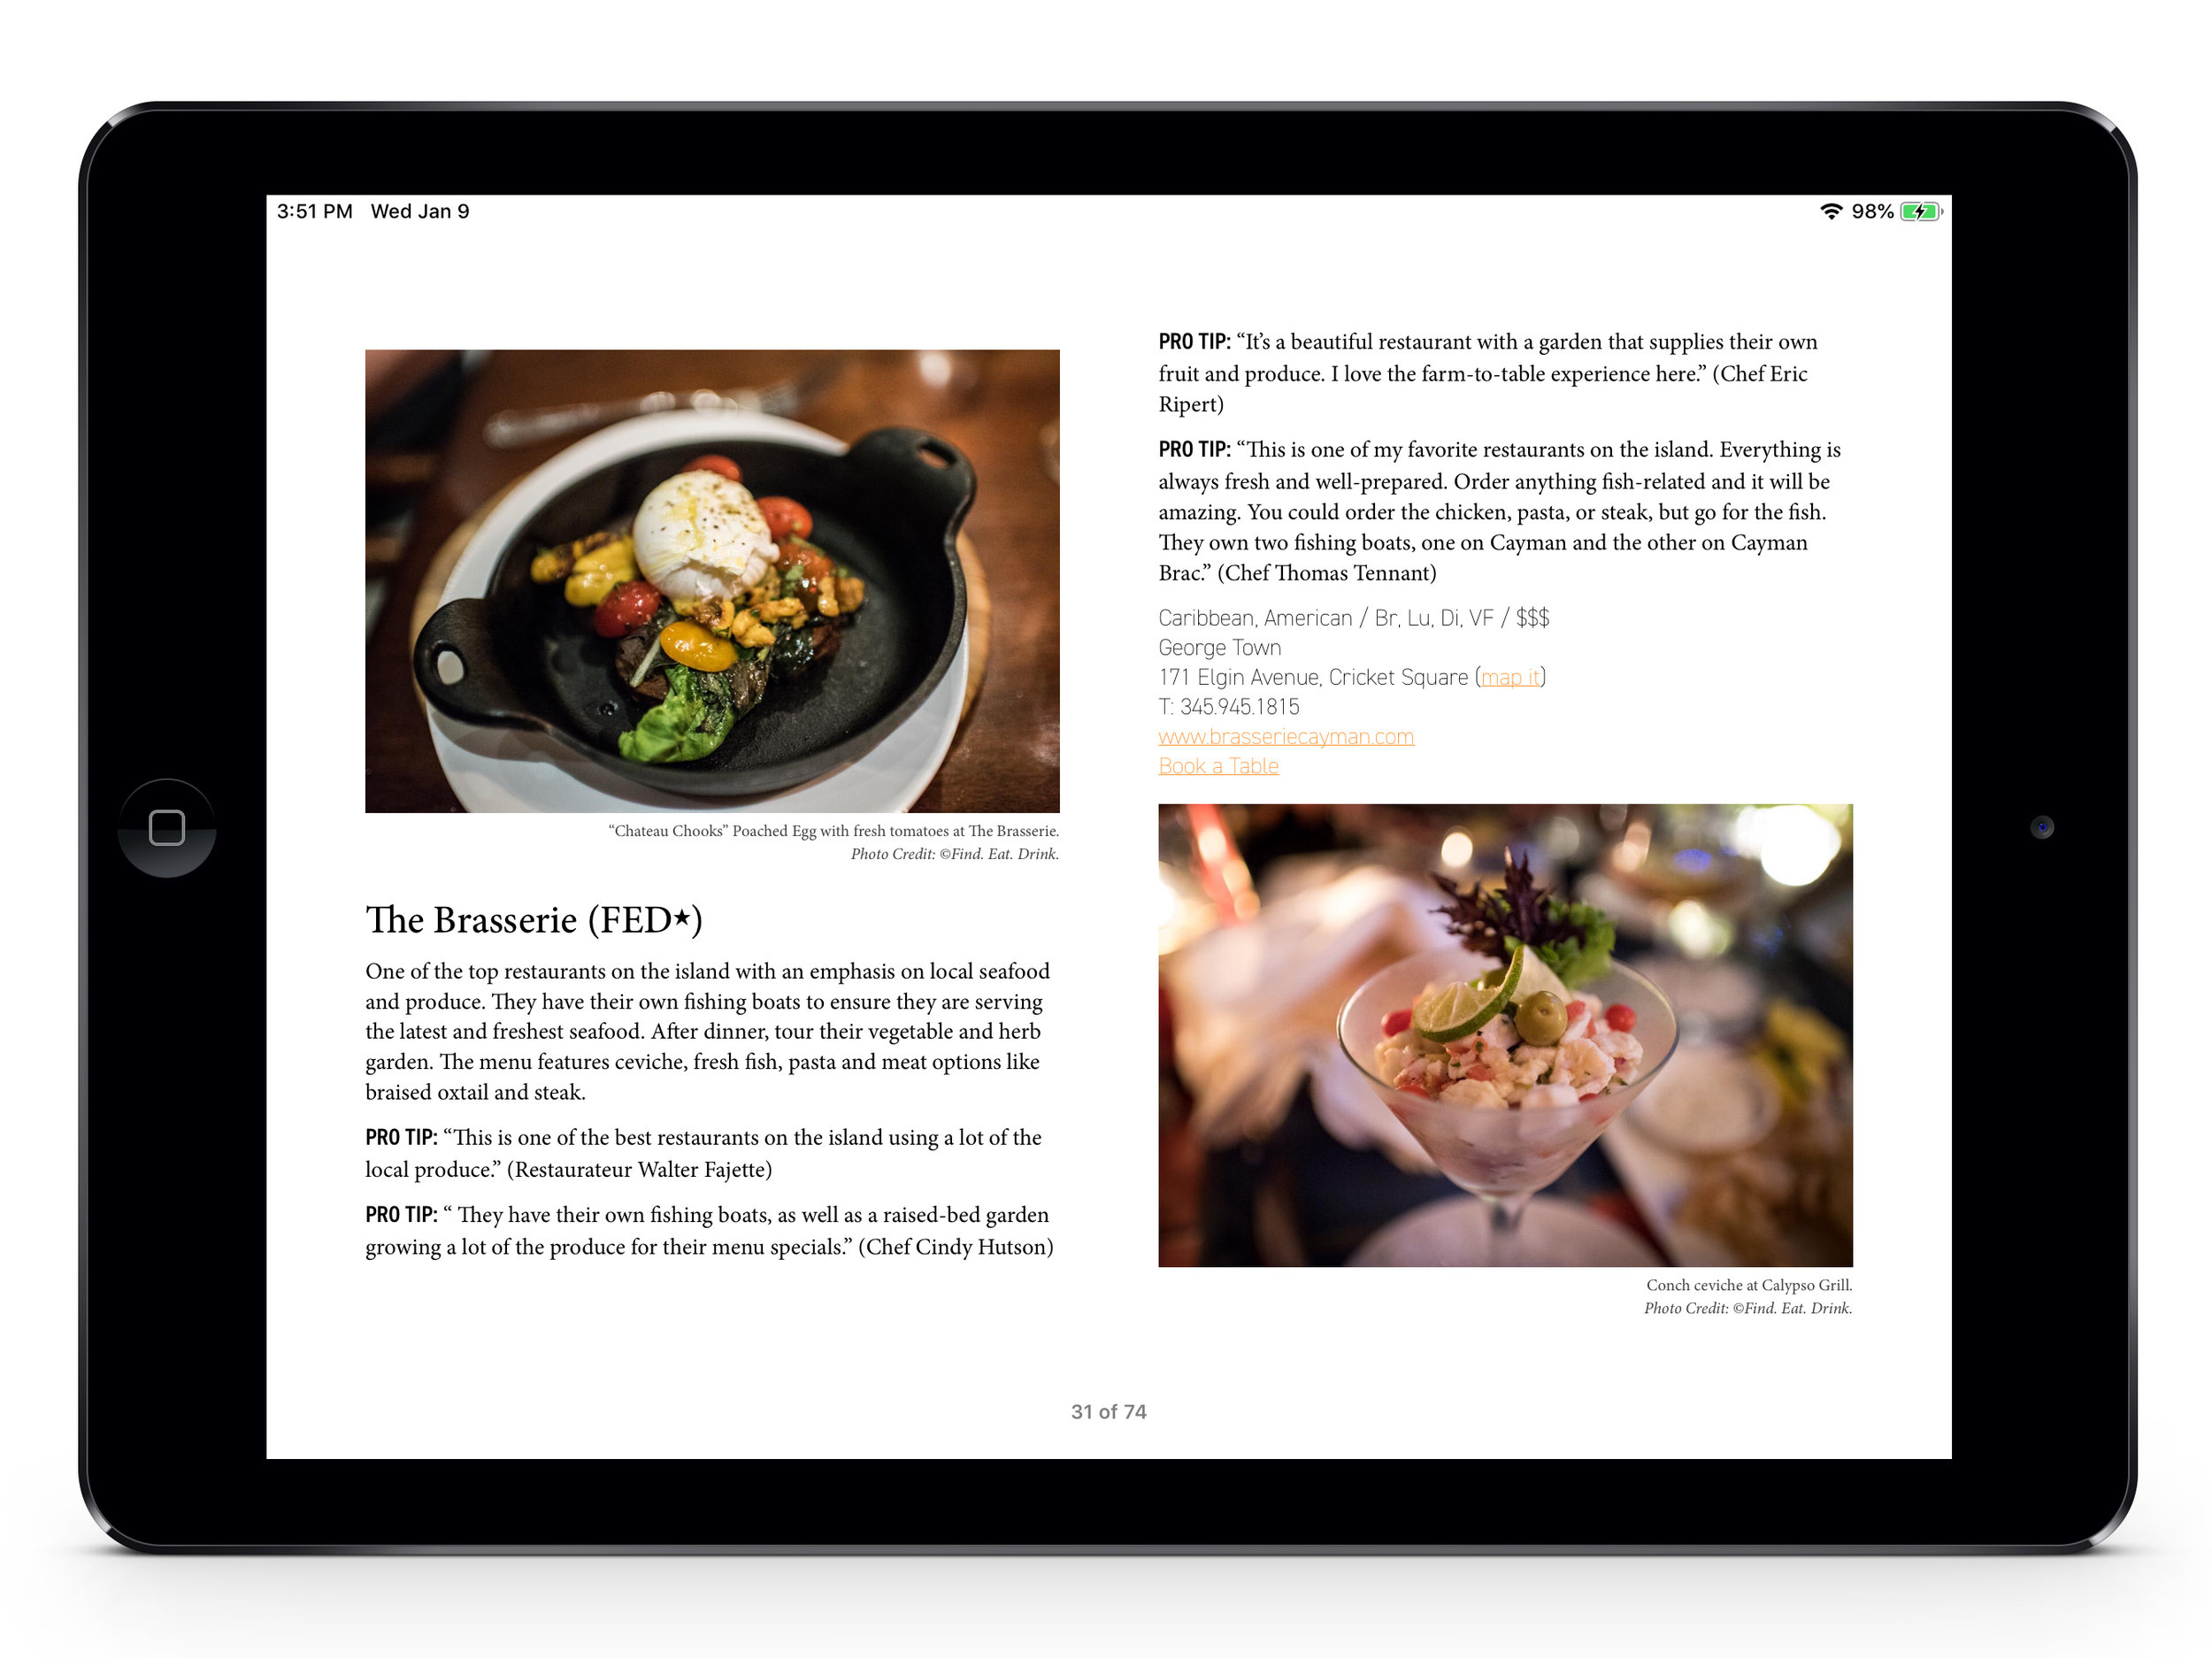 iPadAir_GrandCayman_Screenshots_Landscape_1.10.jpg